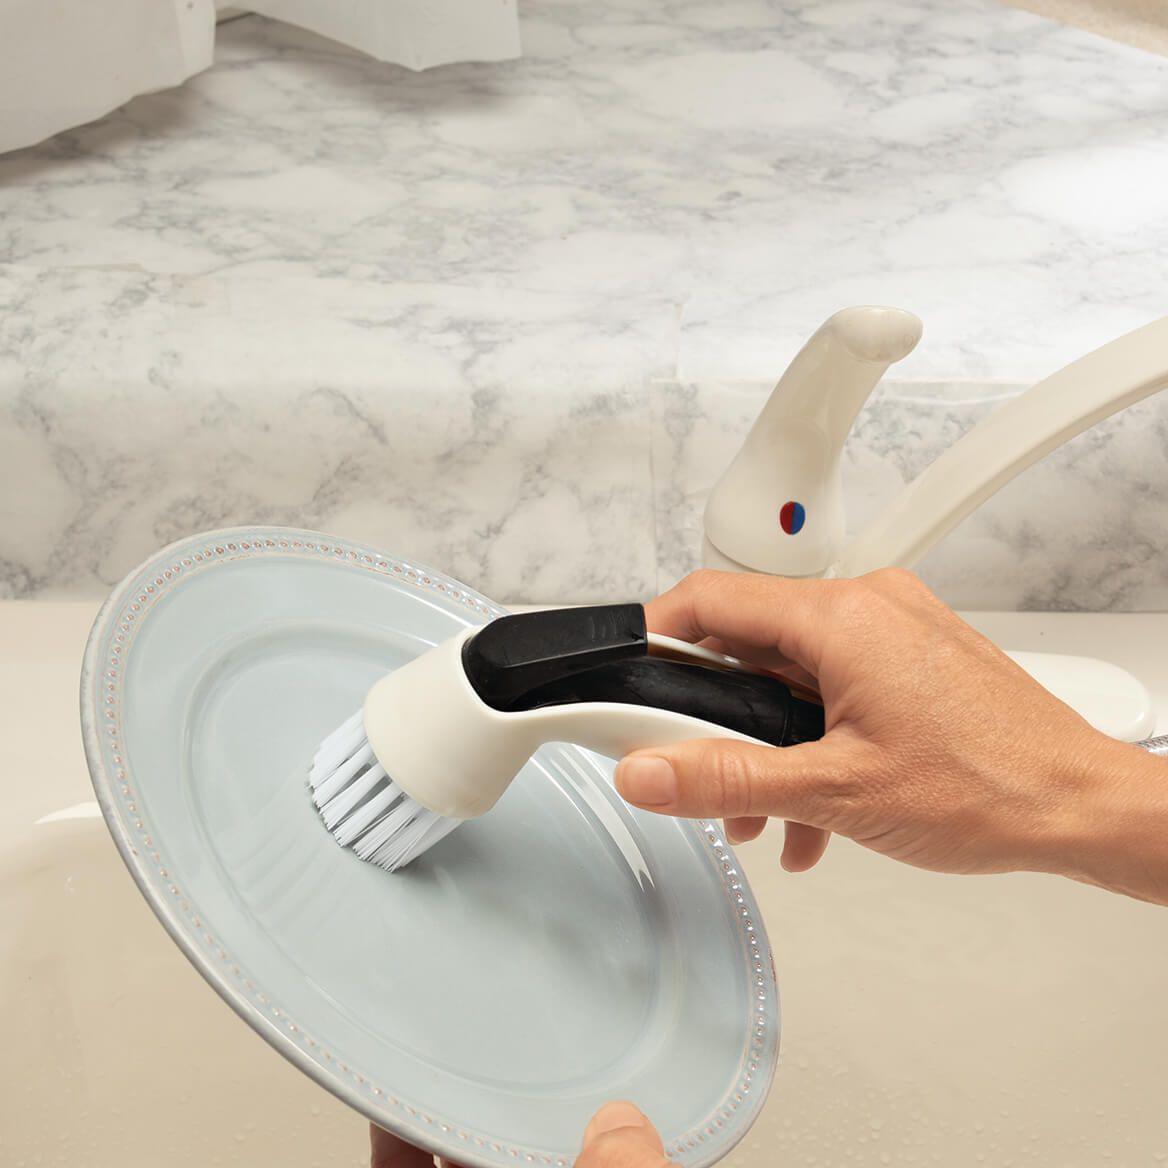 Snap-On Sprayer Scrubber Attachment by Chef's Pride™-372356